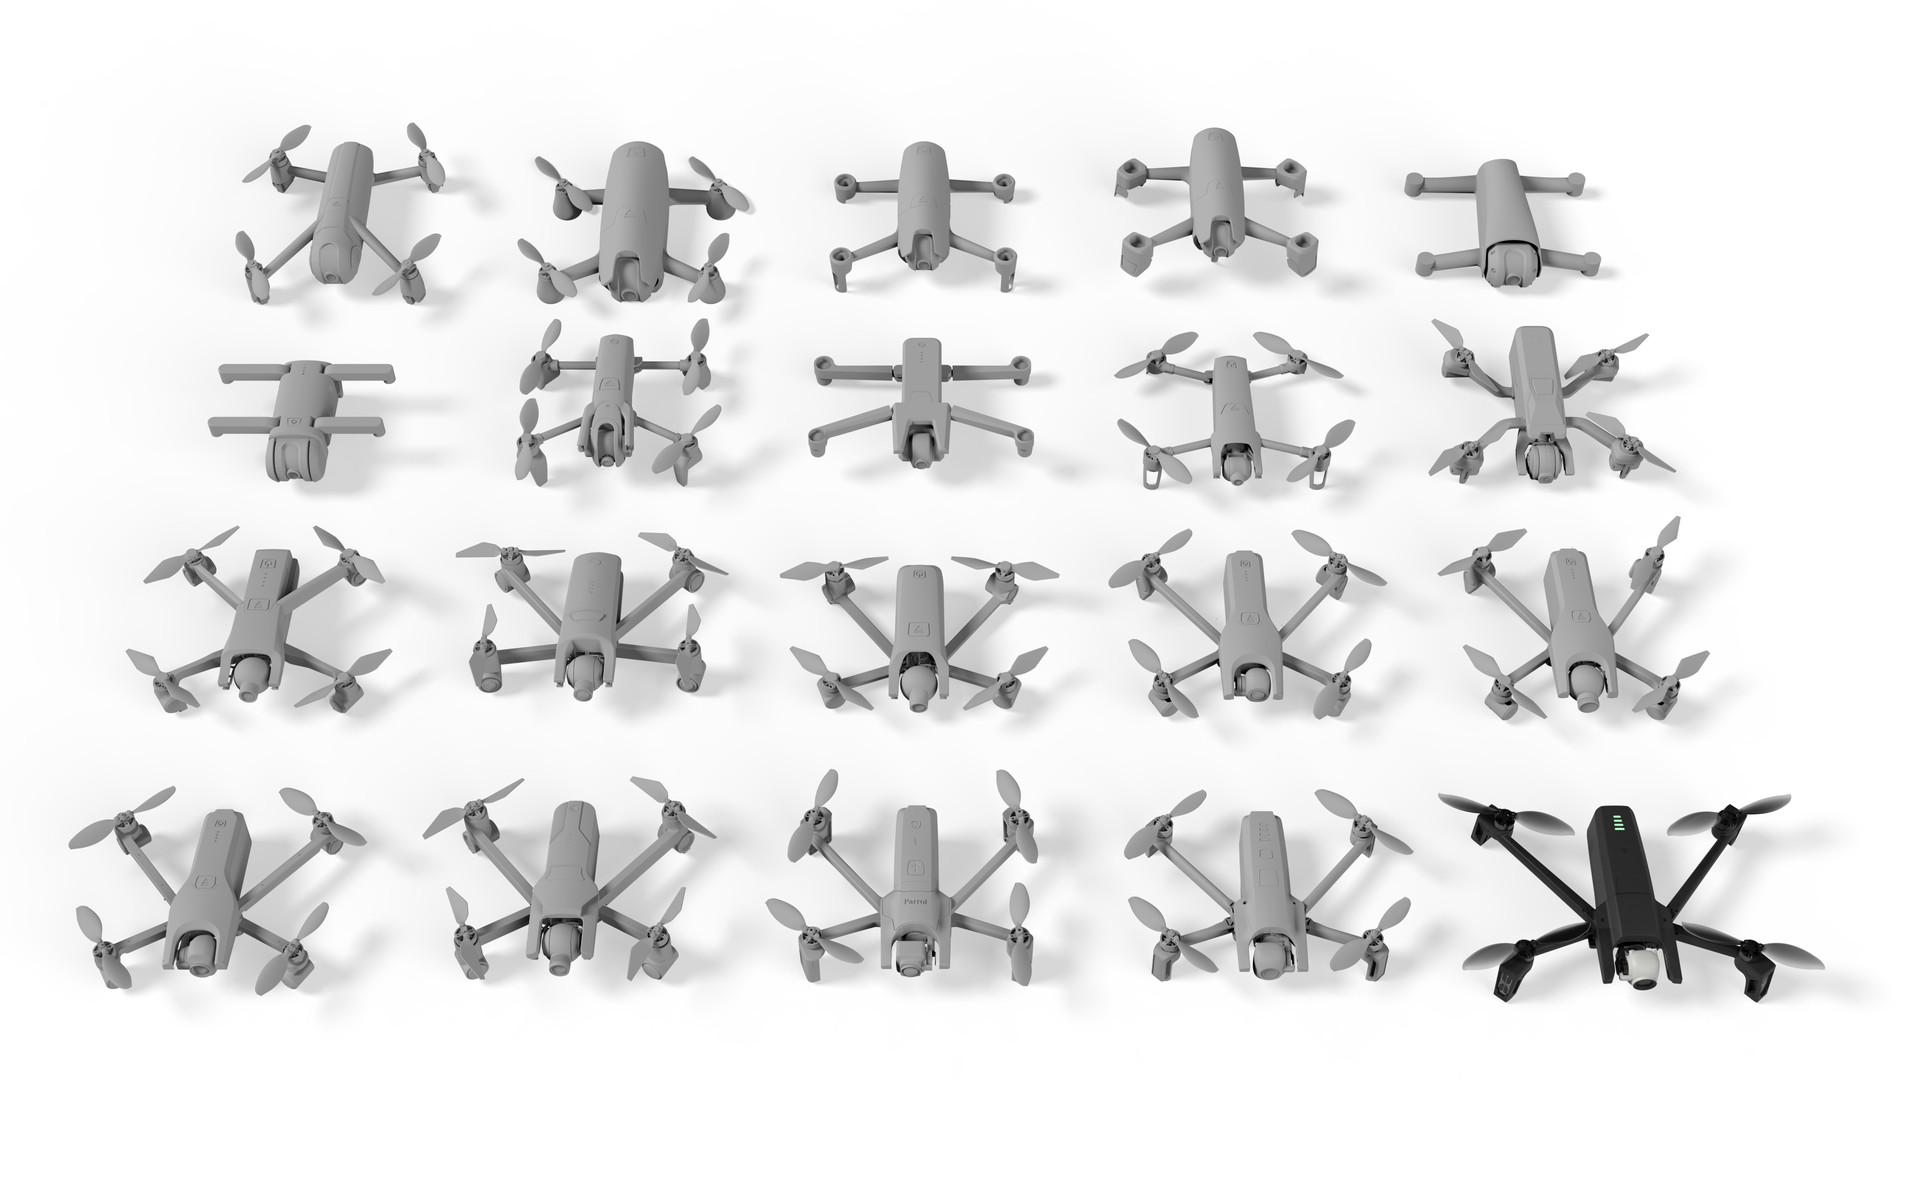 0.1ANAFI4K_Thibaud Keller design_recherc